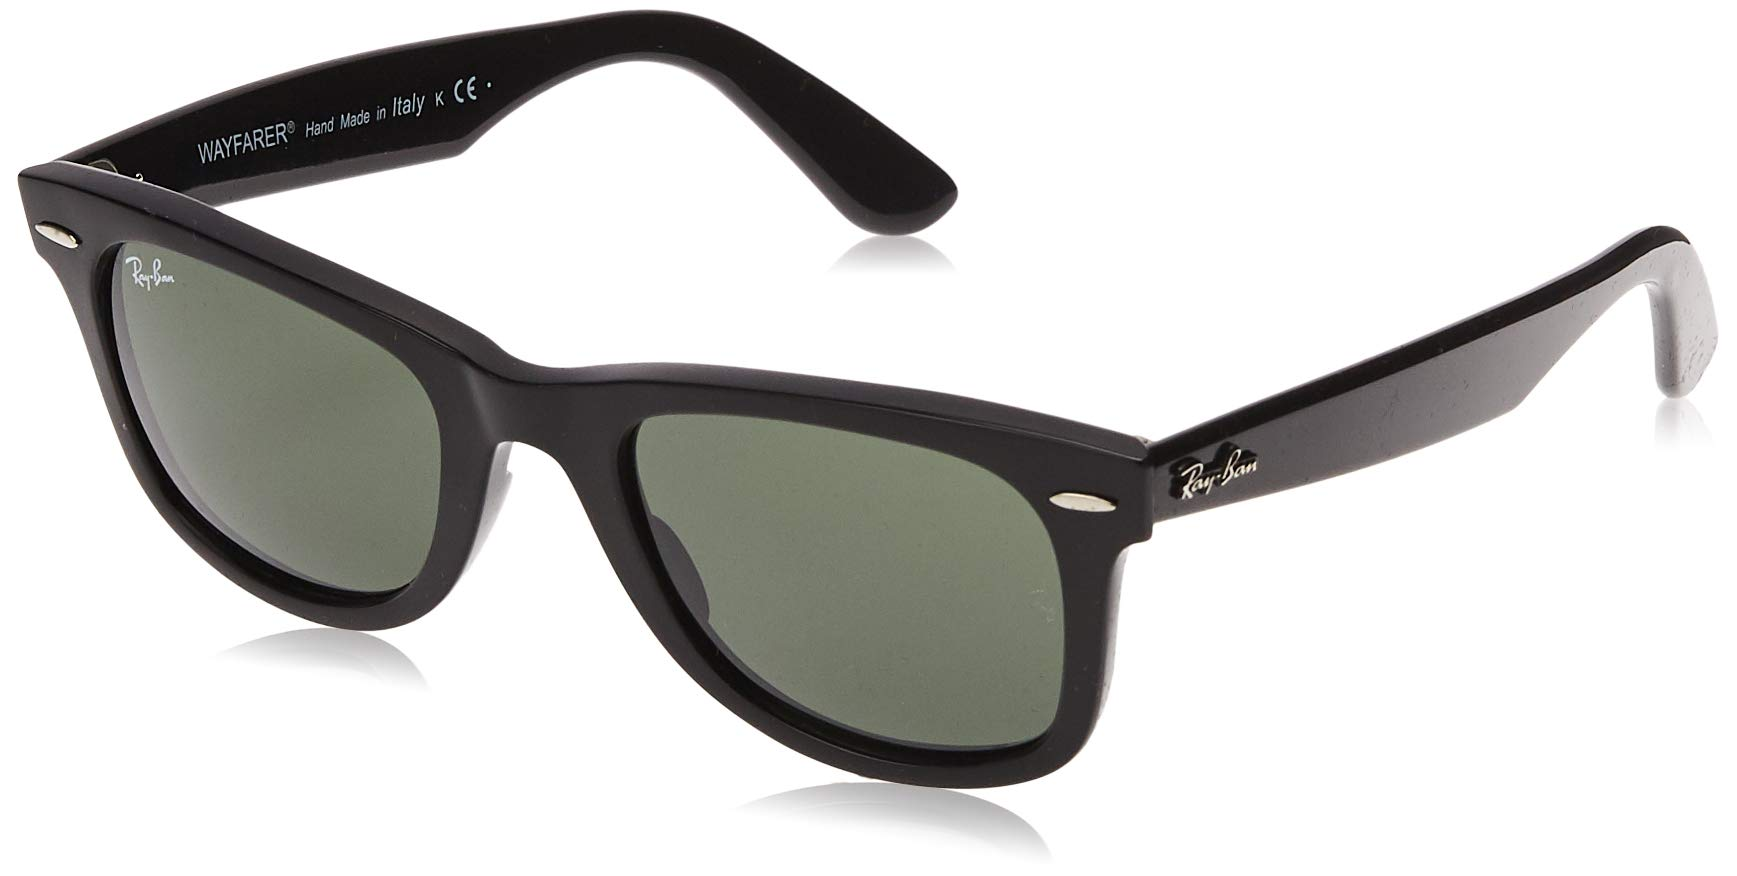 original ray ban sunglasses price in uae